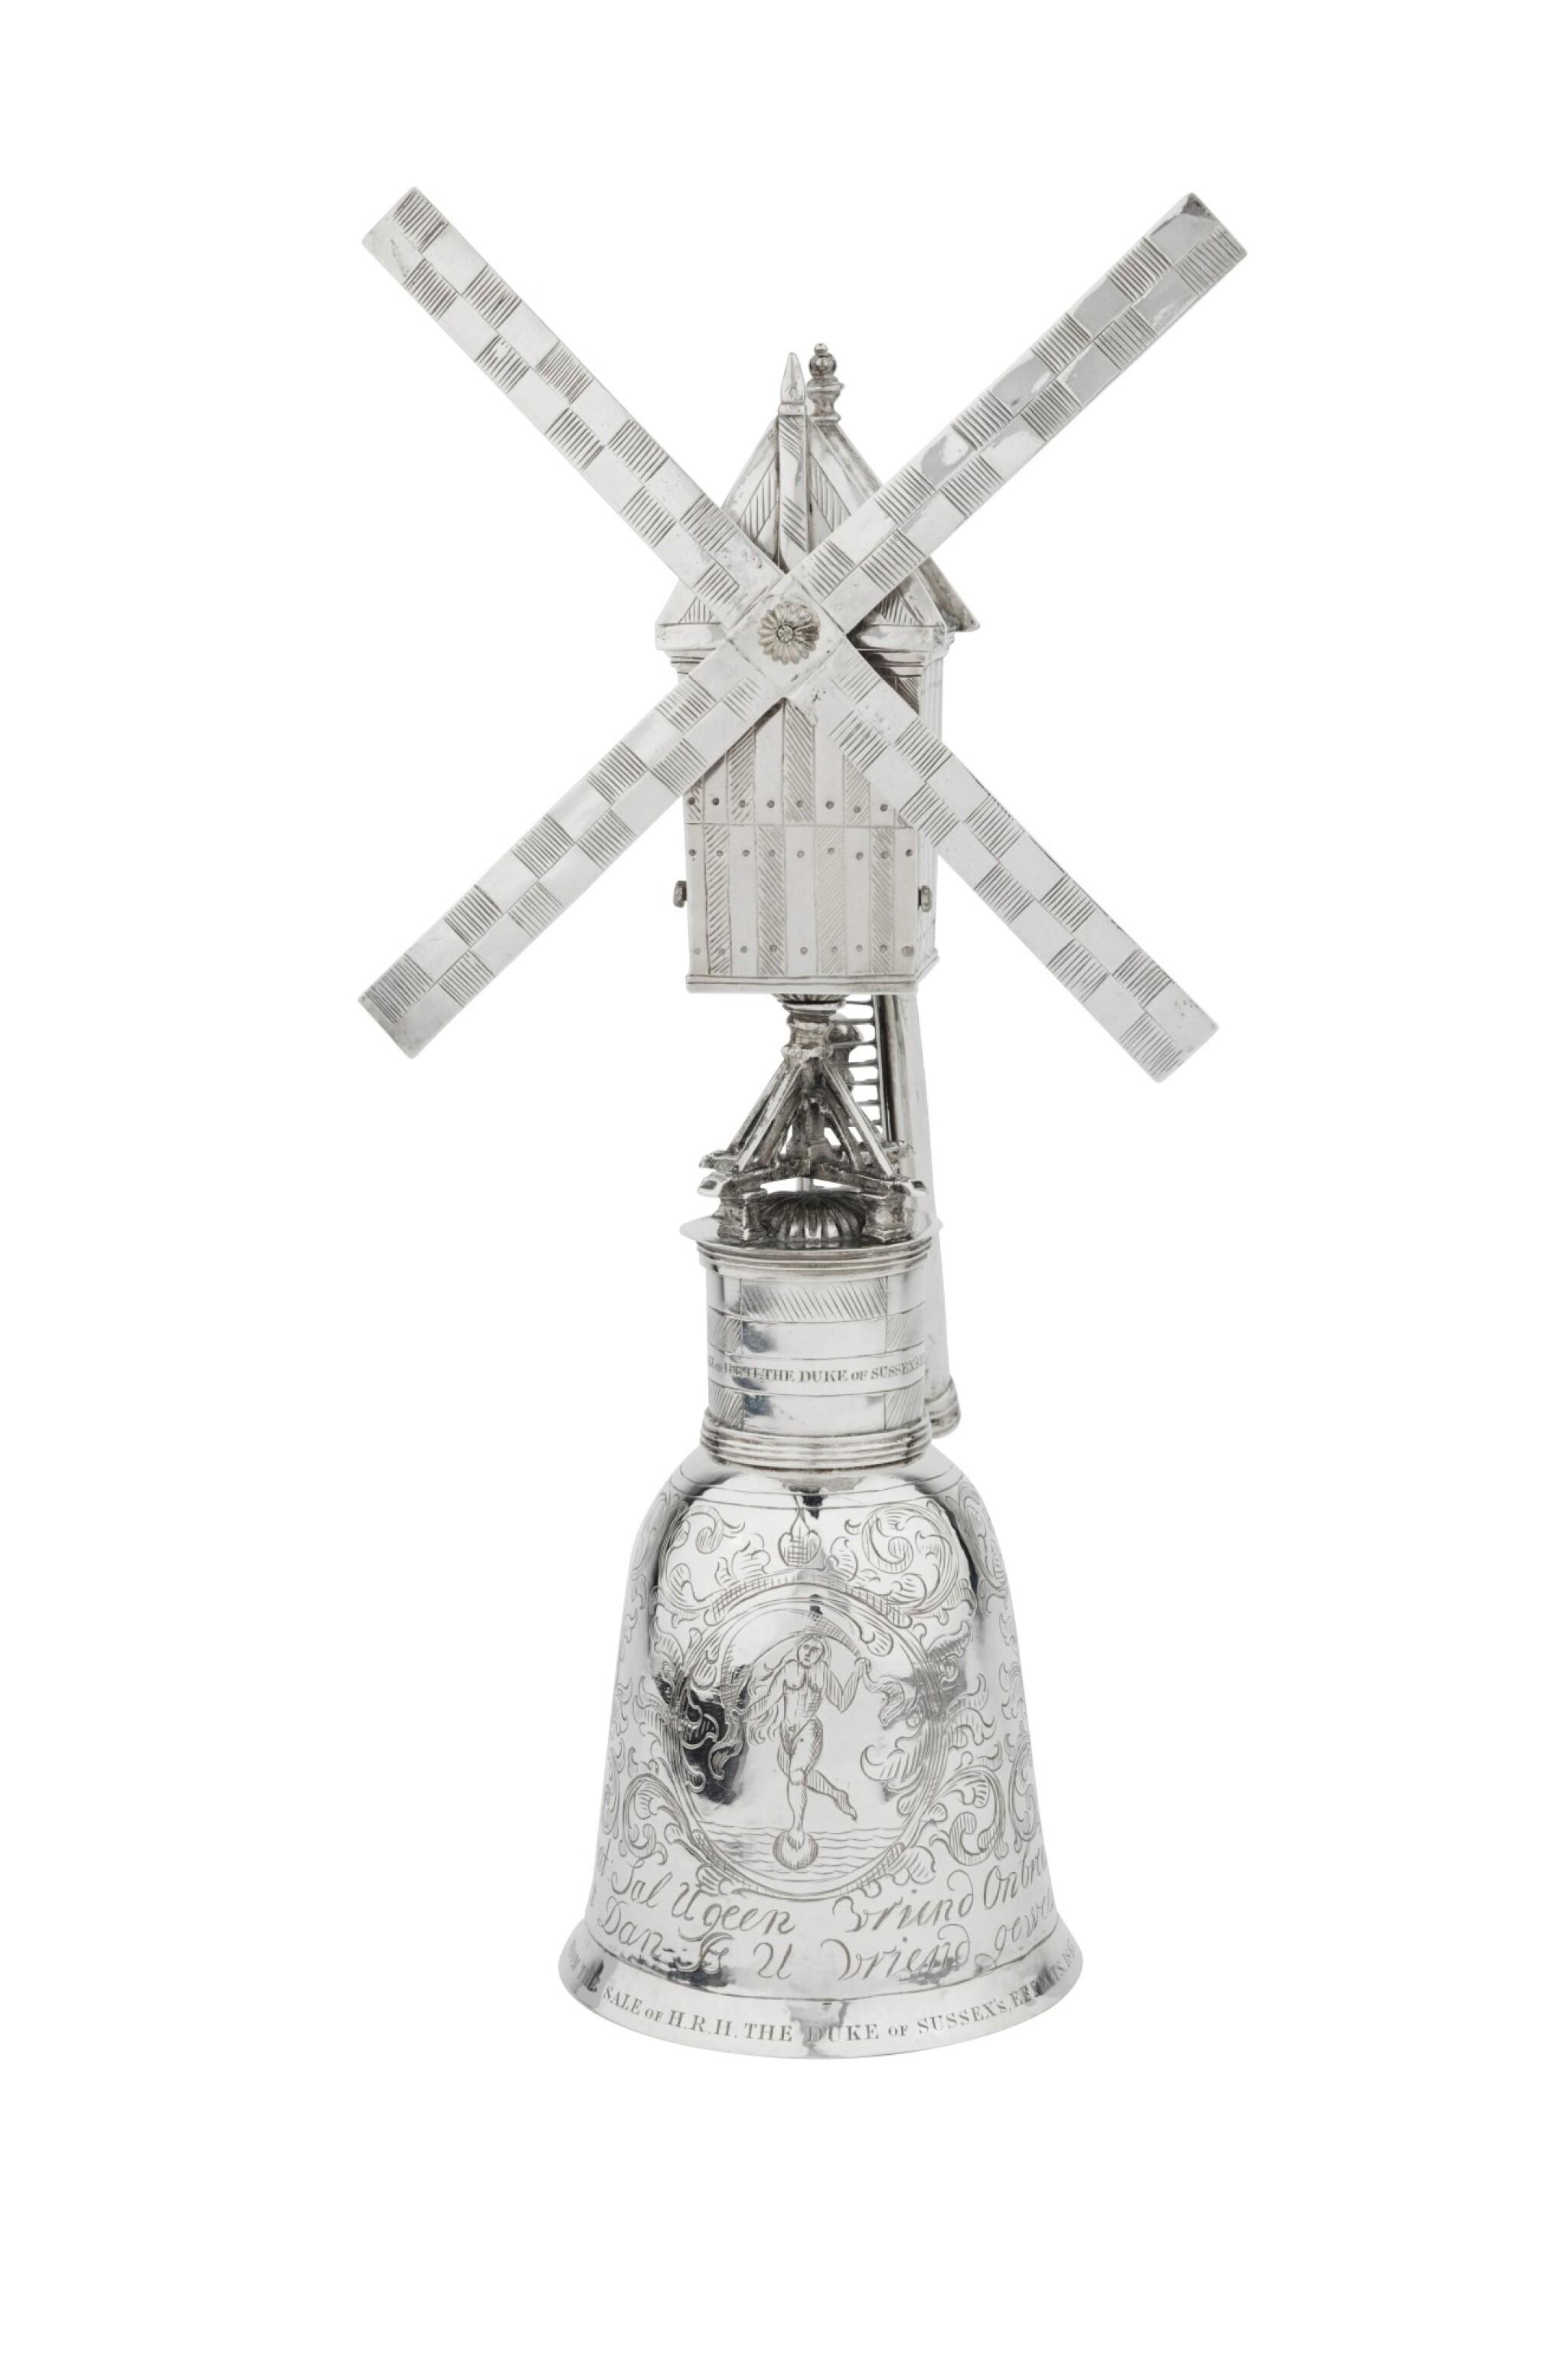 View full screen - View 1 of Lot 1. A Dutch silver windmill cup, unknown maker's mark, Zierikzee, 1724-1732 | Coupe en forme de moulin à vent en argent, Zierikzee, 1724-1732.